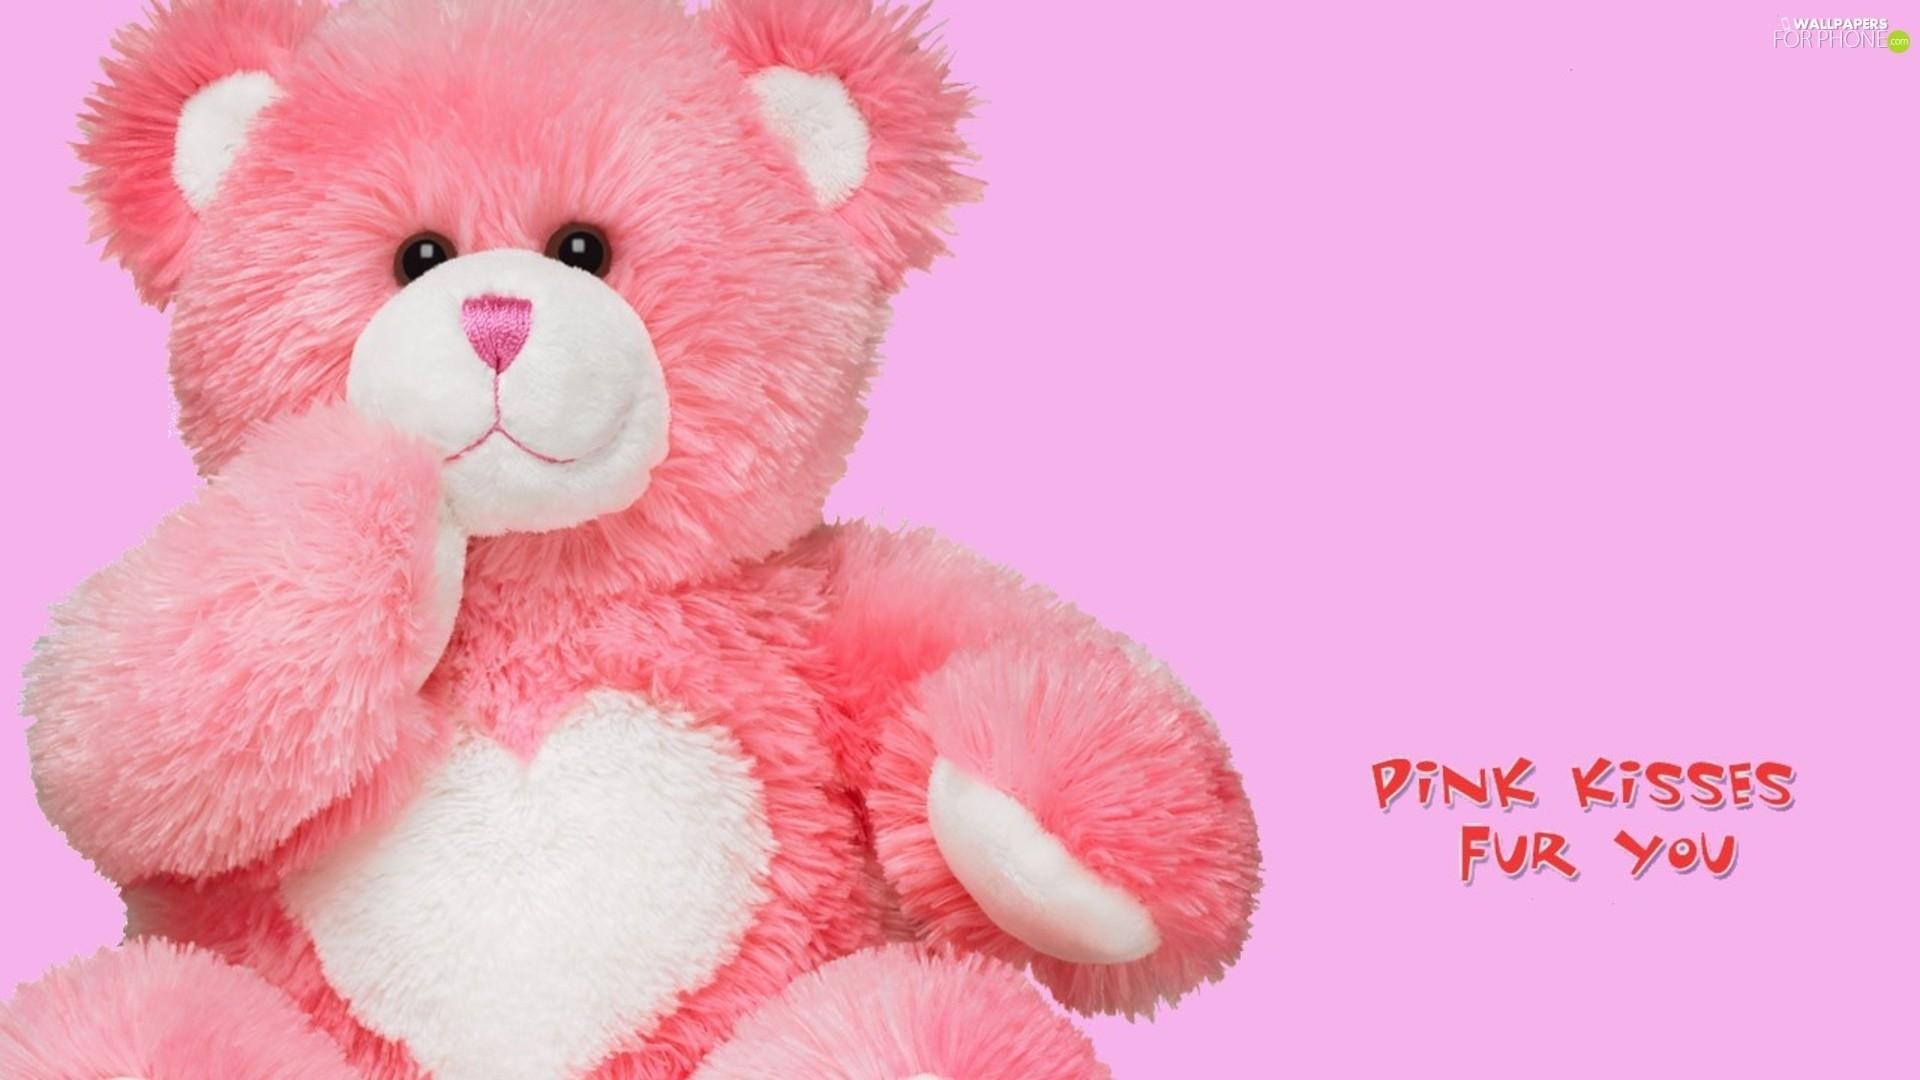 Pink, Fur, teddy bear